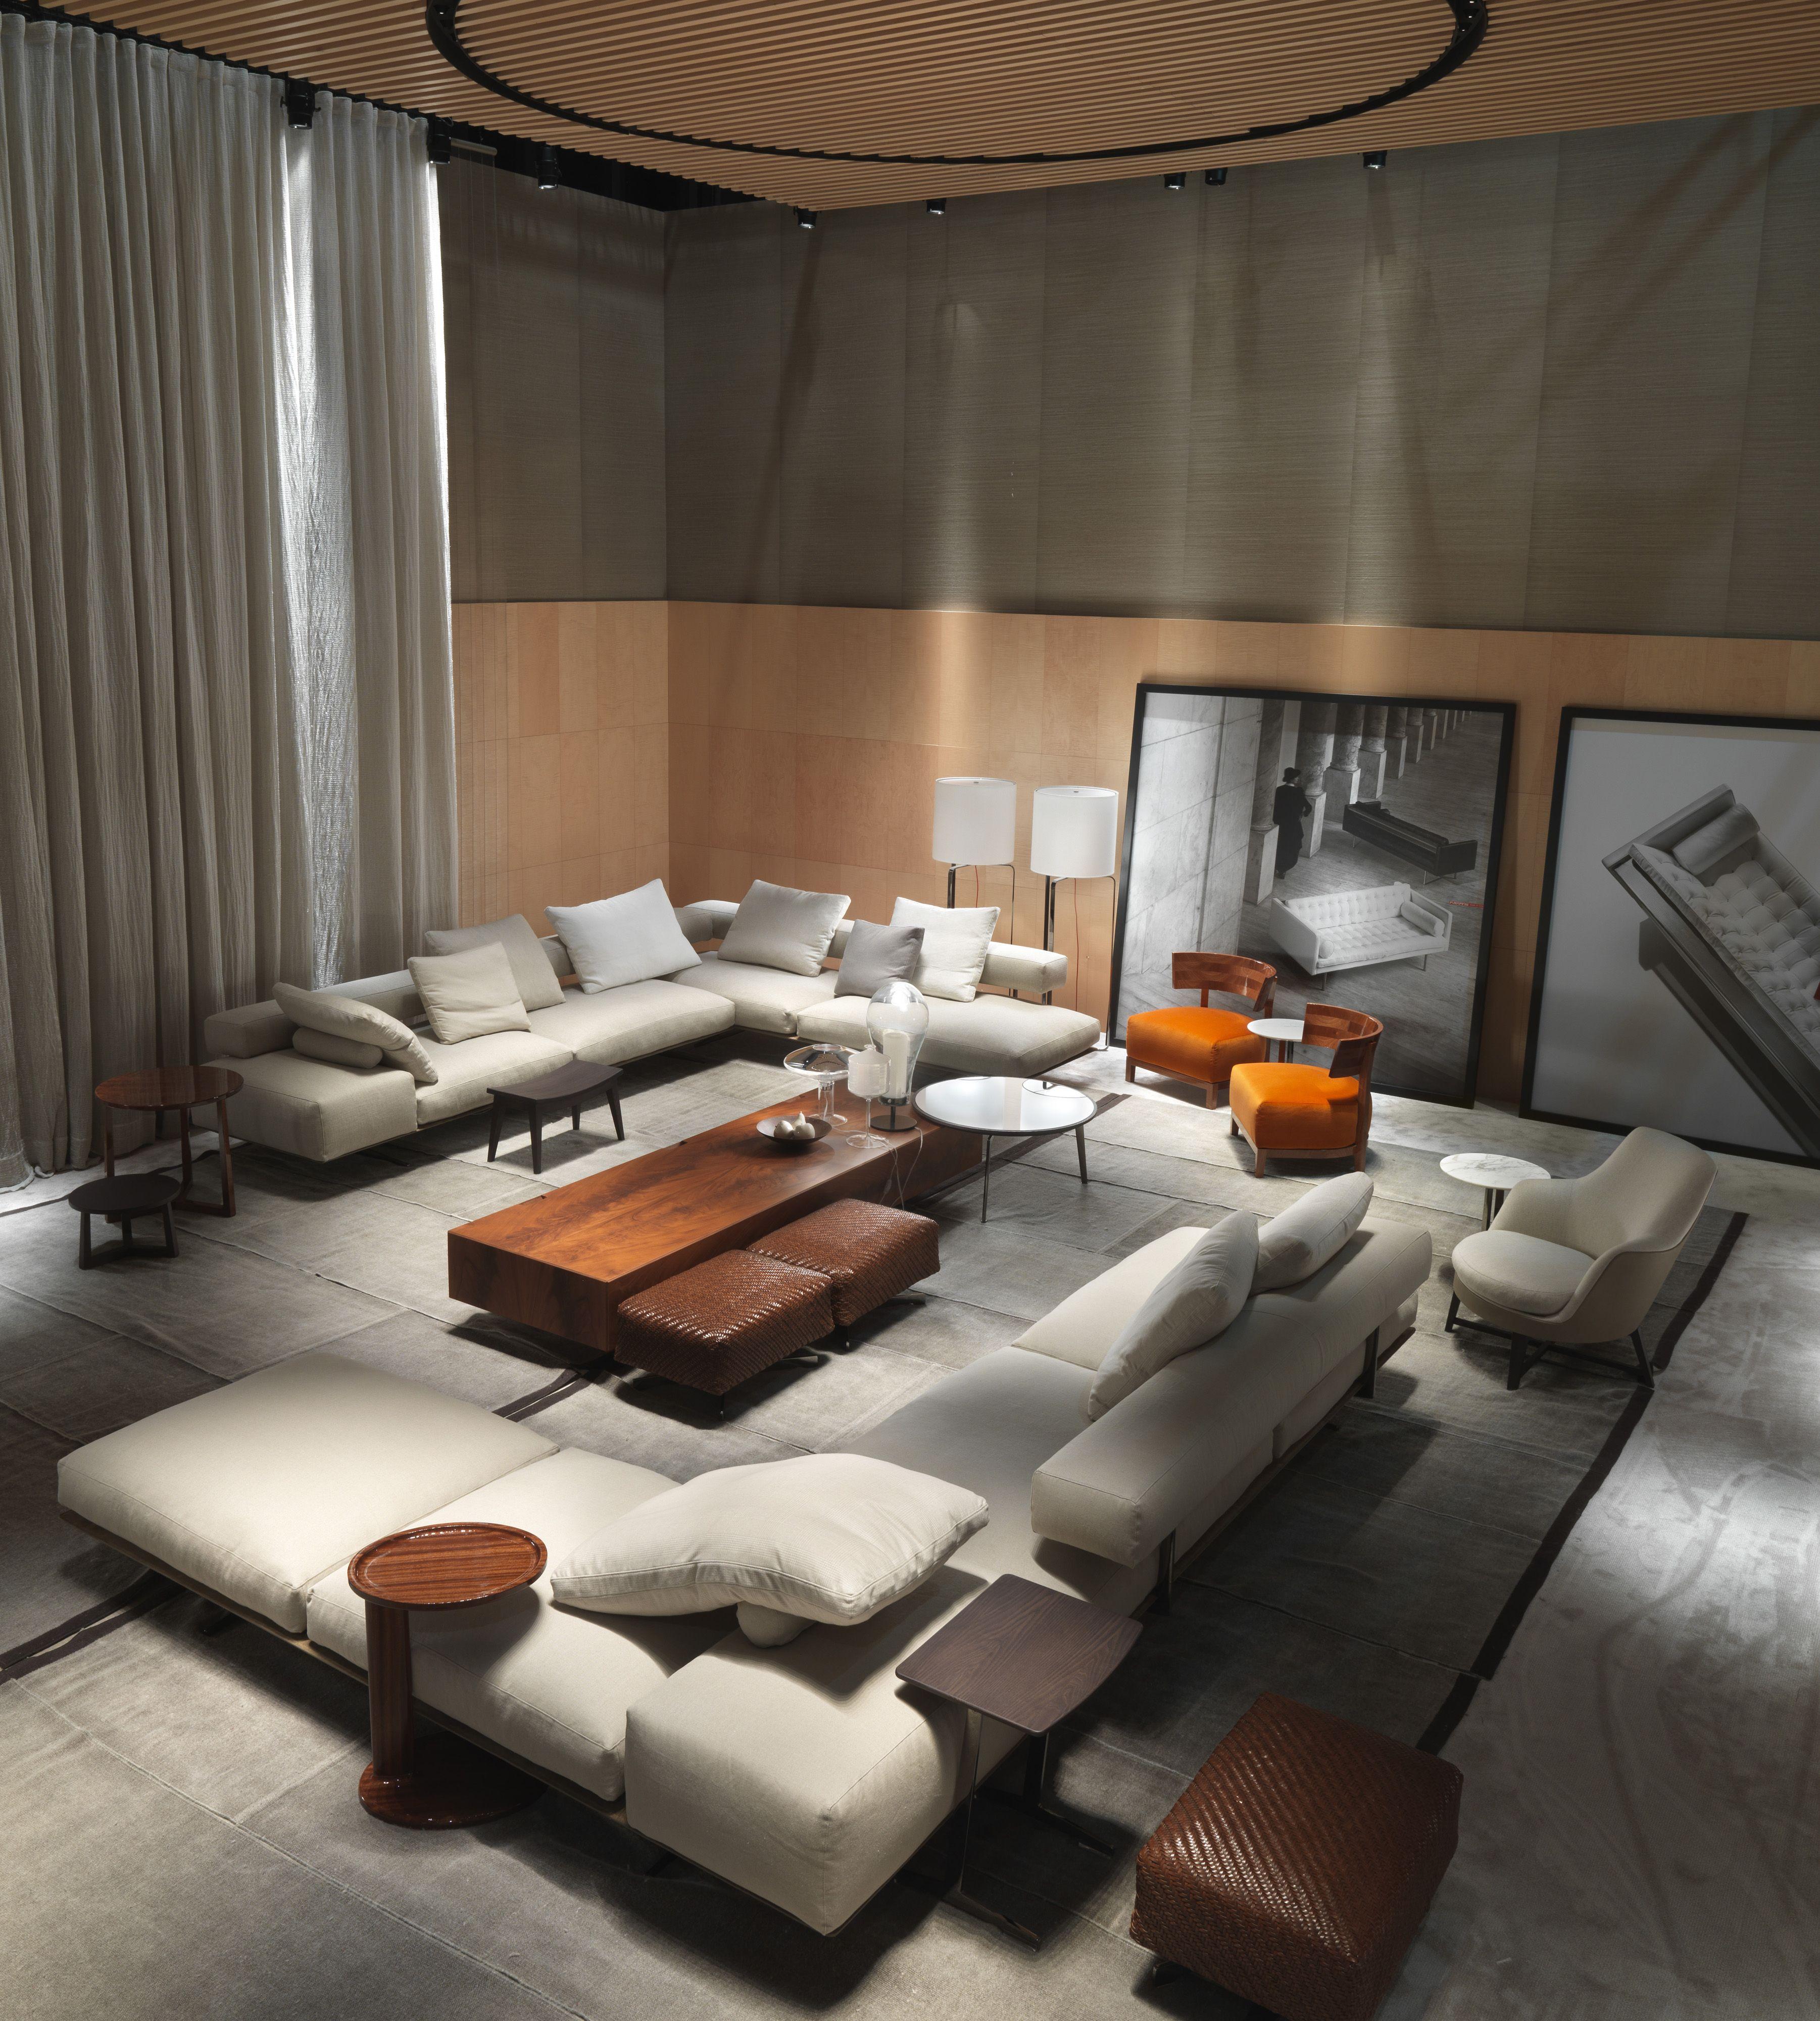 FLEXFORM WING sectional sofa area furniture